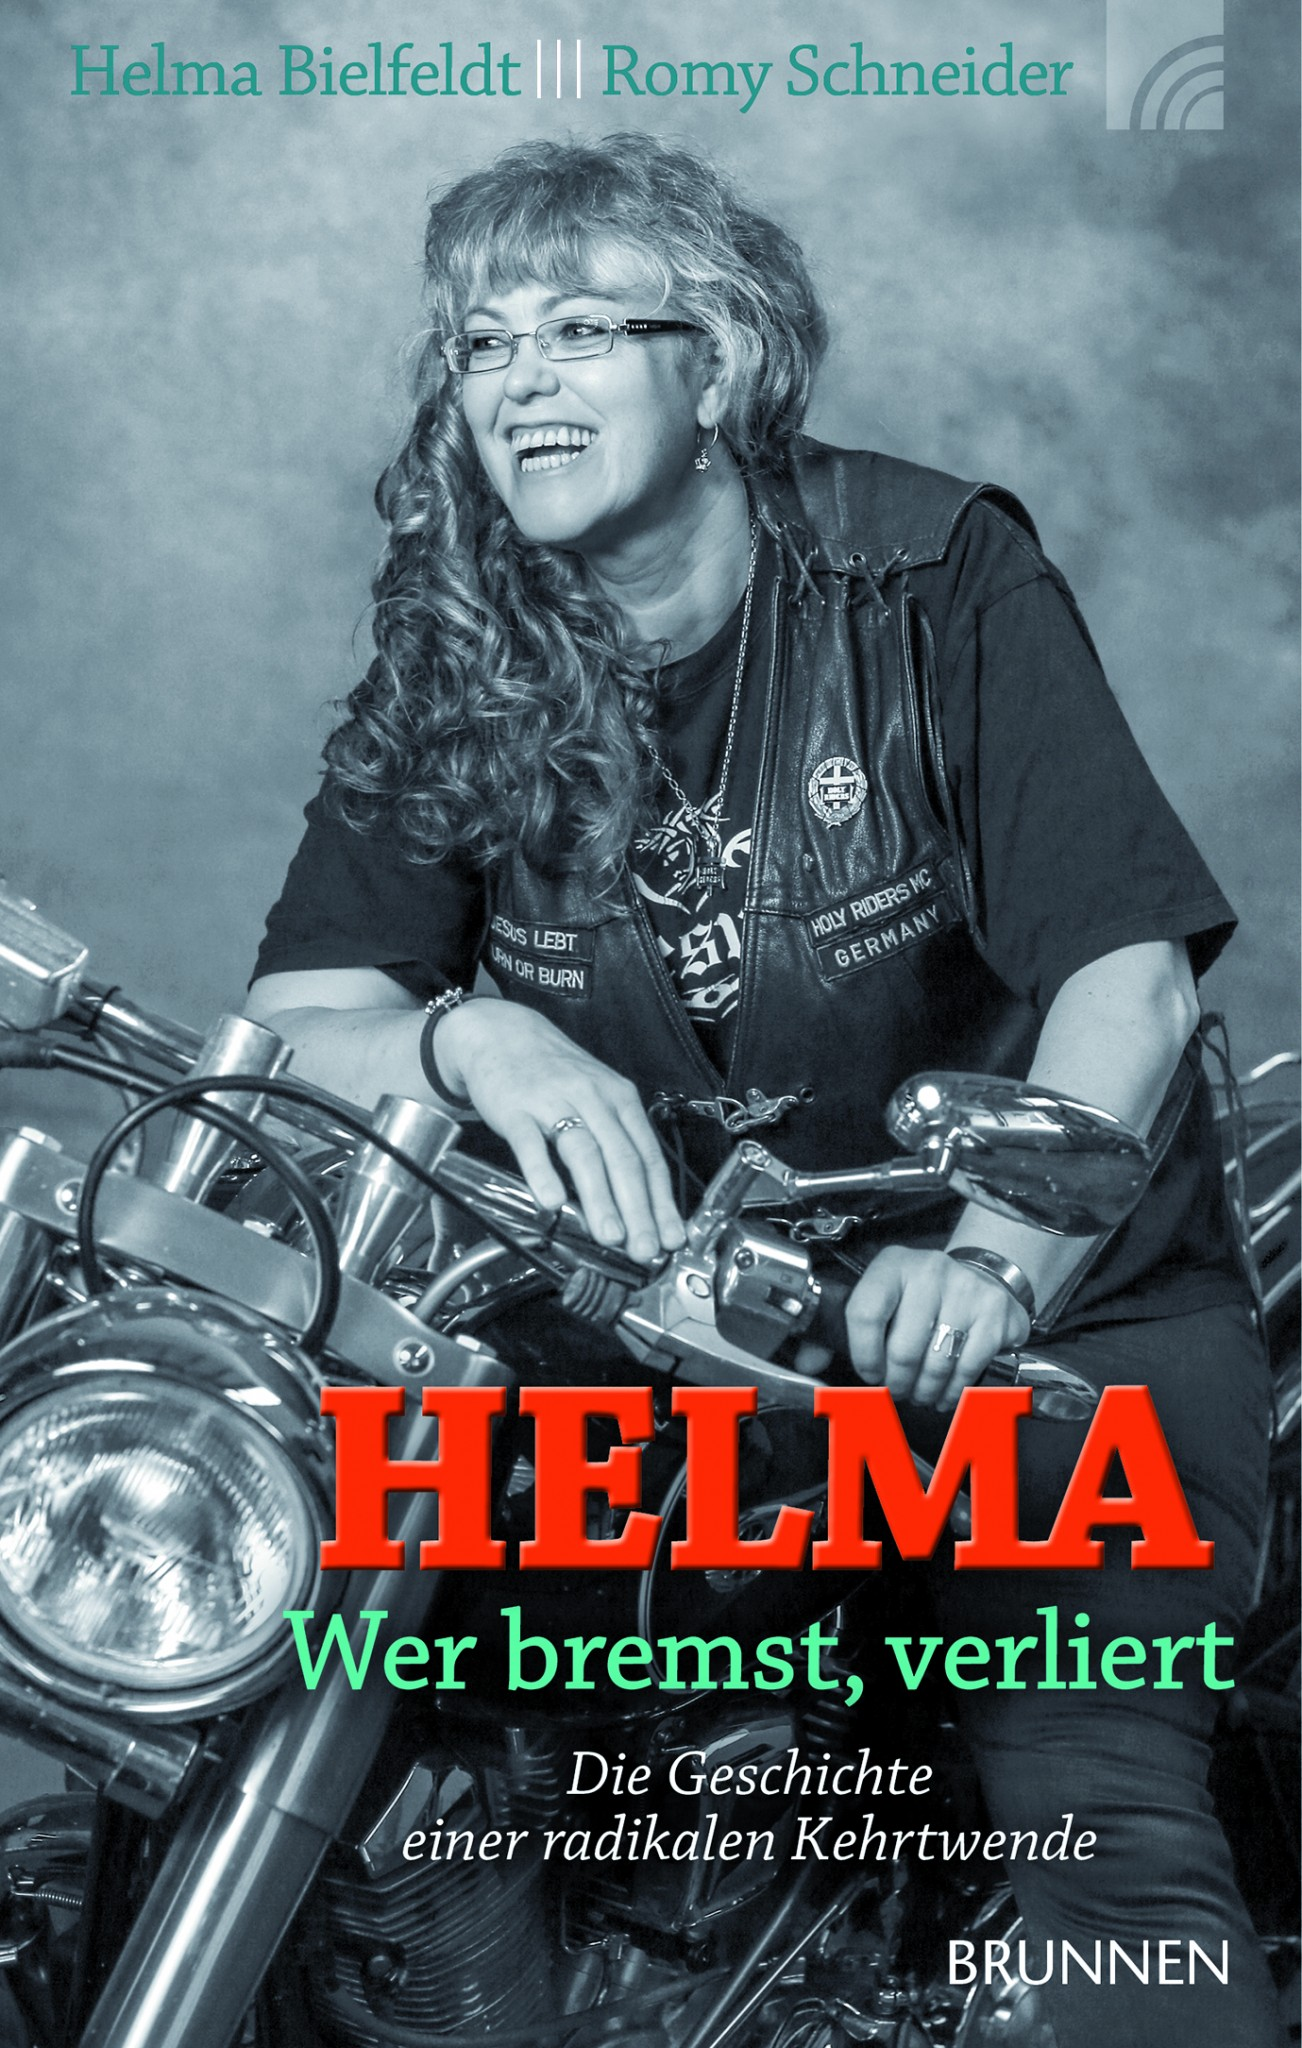 Rocker Präsidentin Helma Bielfeldt